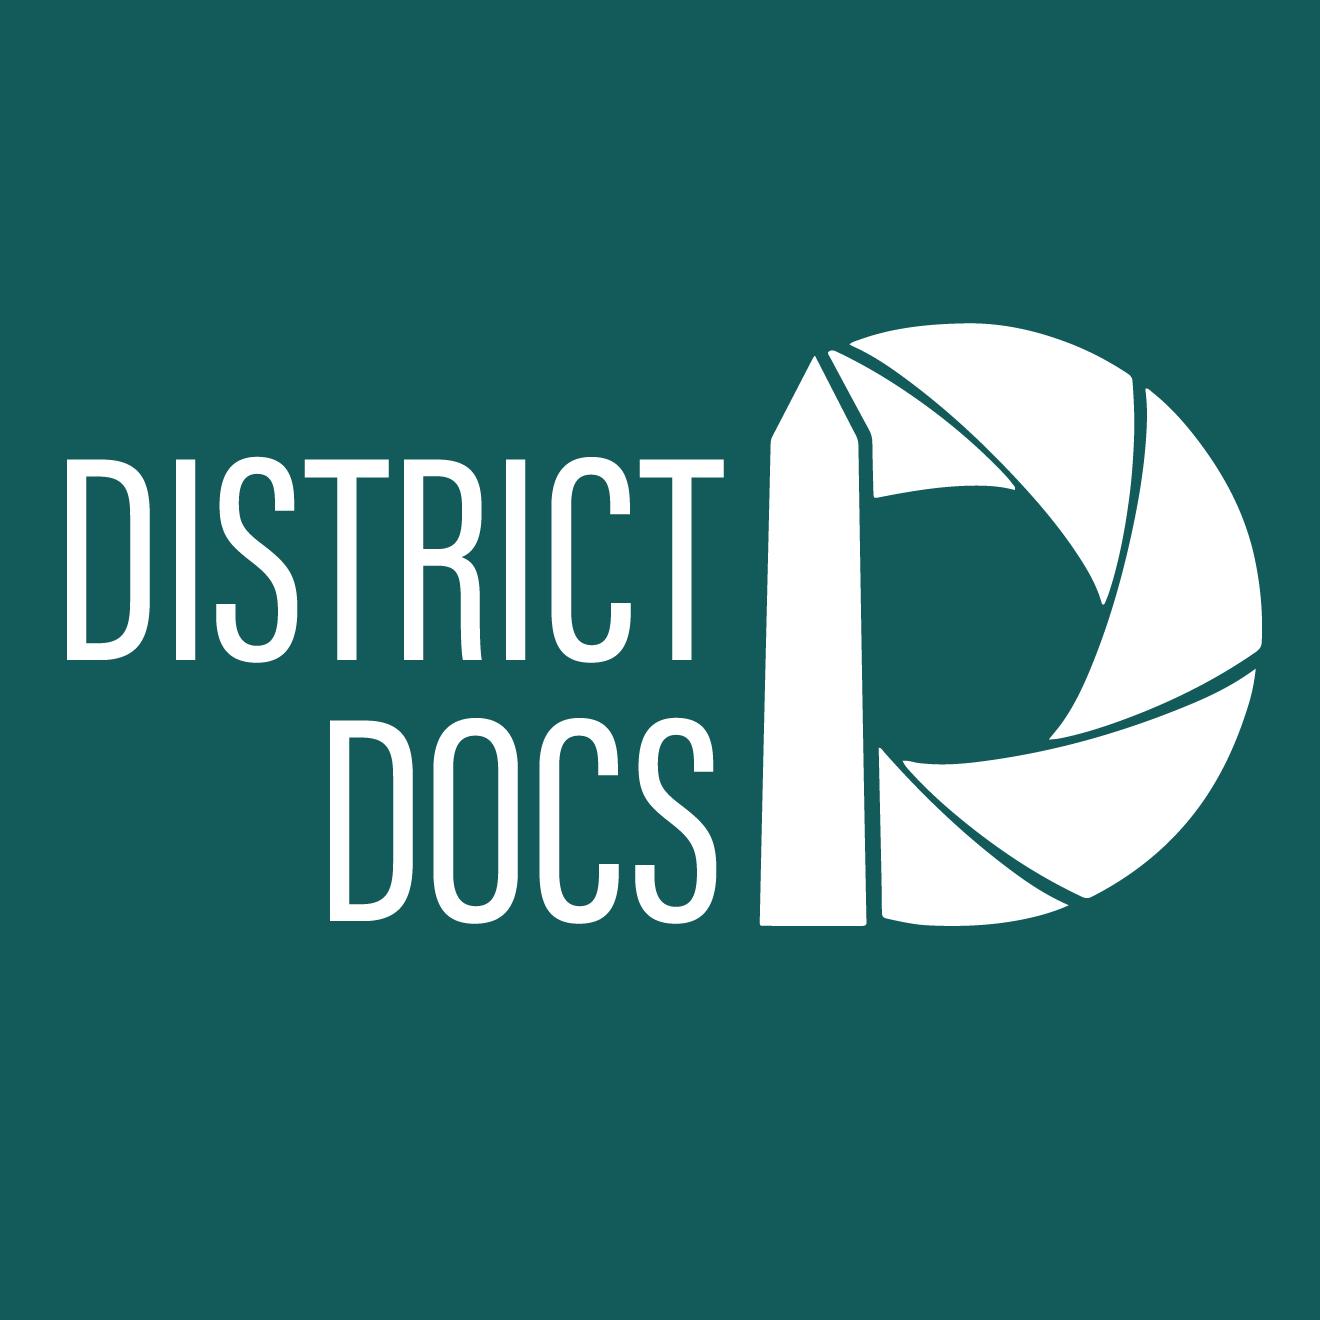 District_Docs_Logo-03.png